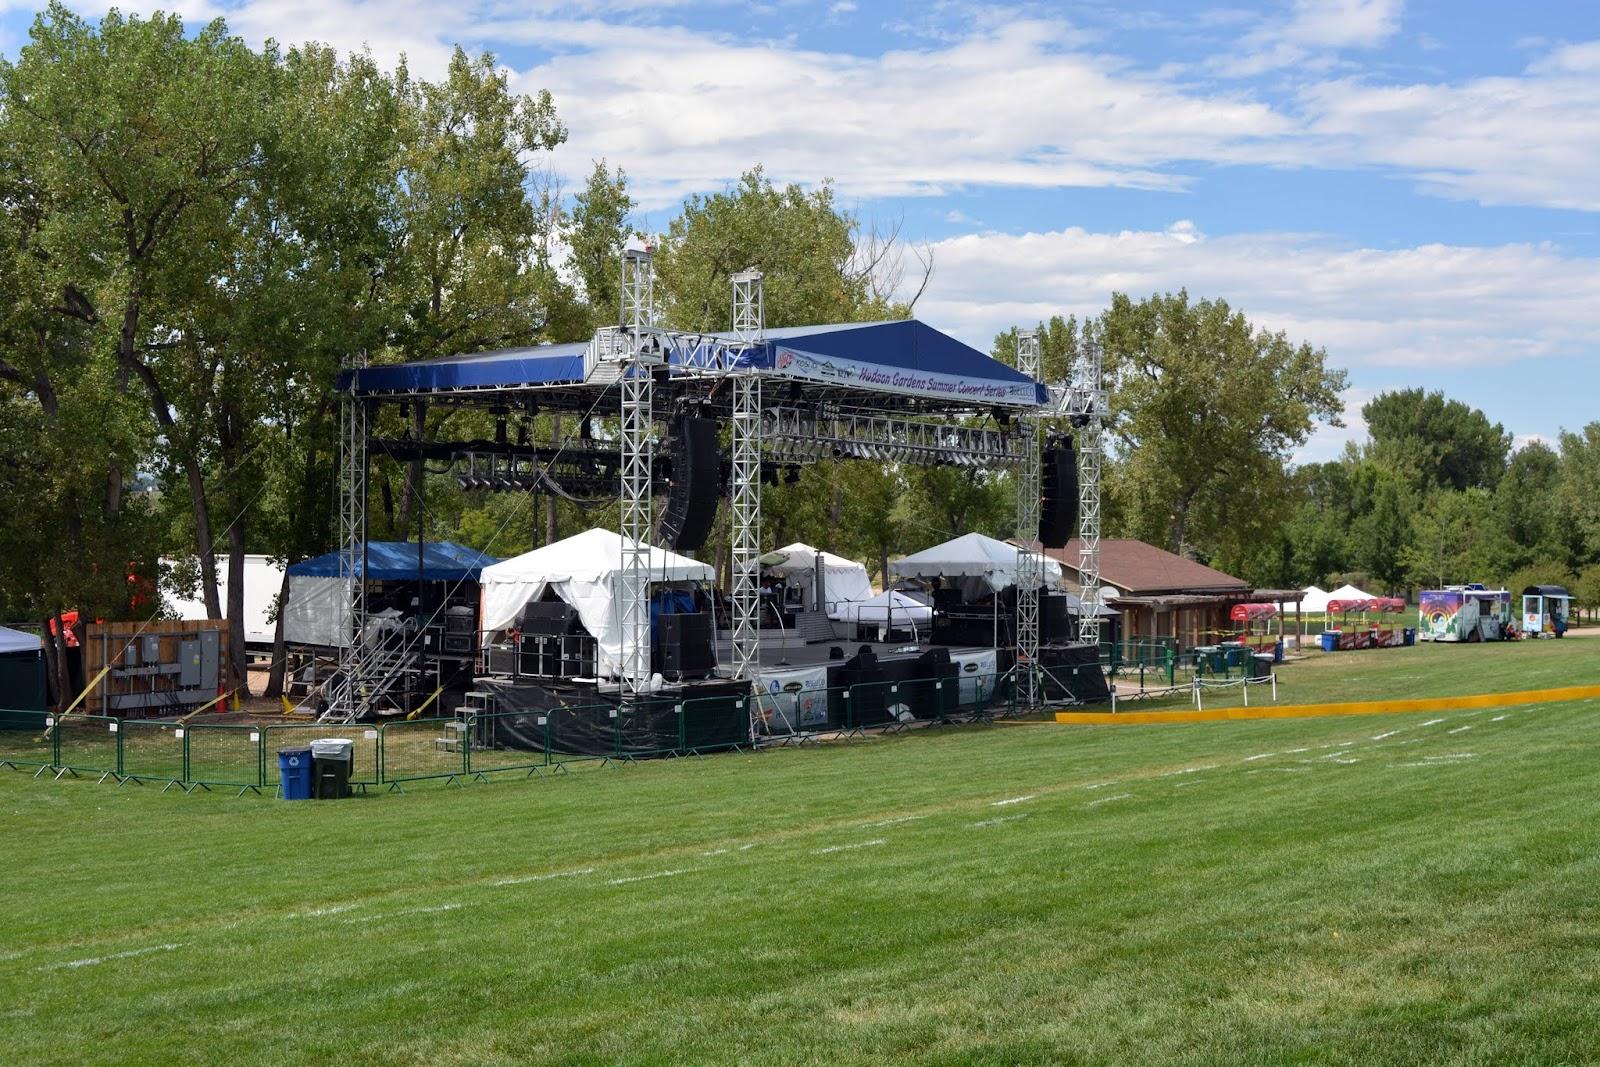 Mille fiori favoriti hudson gardens and event center in littleton co for Hudson gardens concert schedule